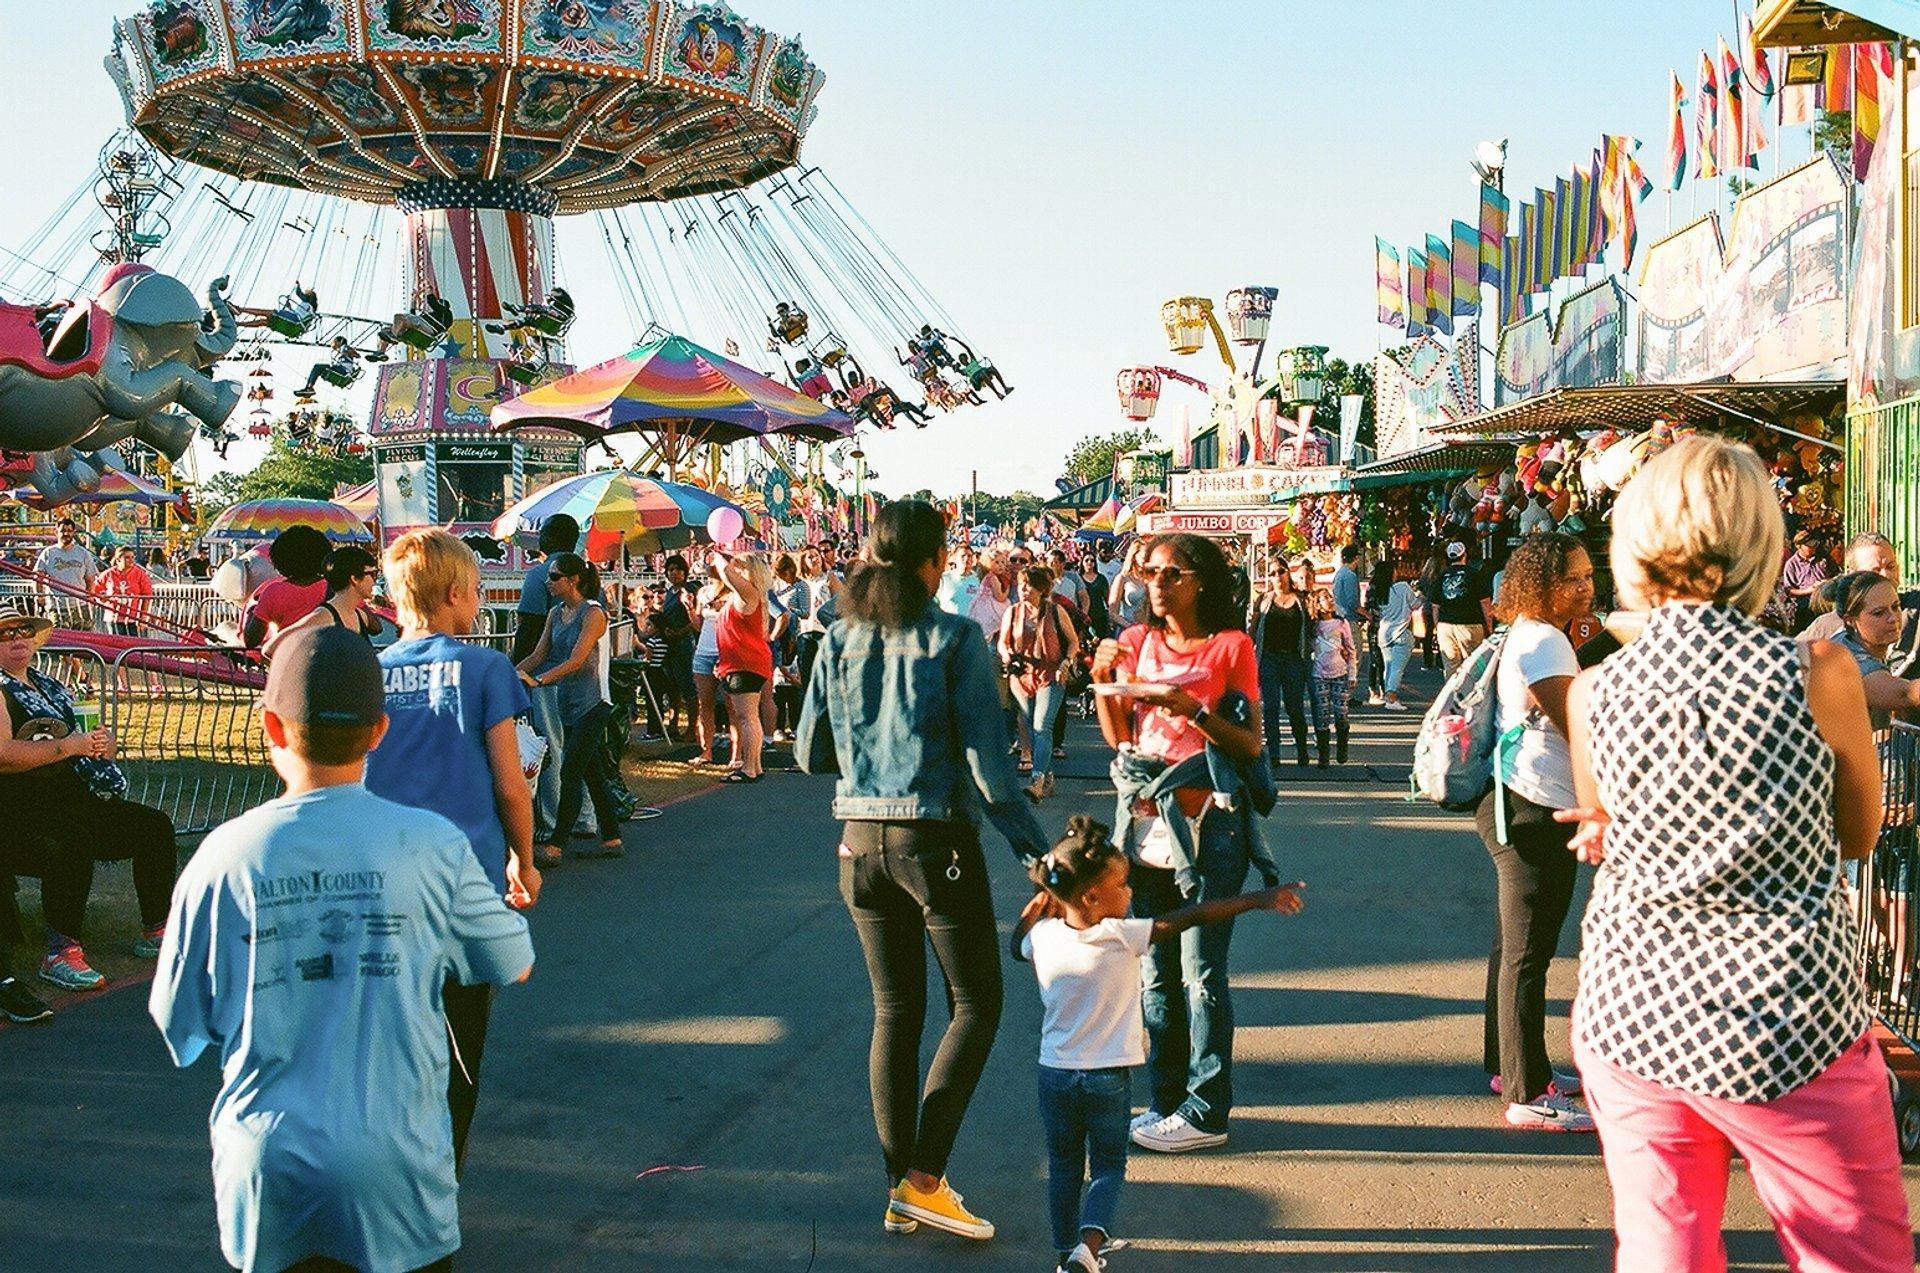 North Georgia State Fair in Georgia - Best Season 2020